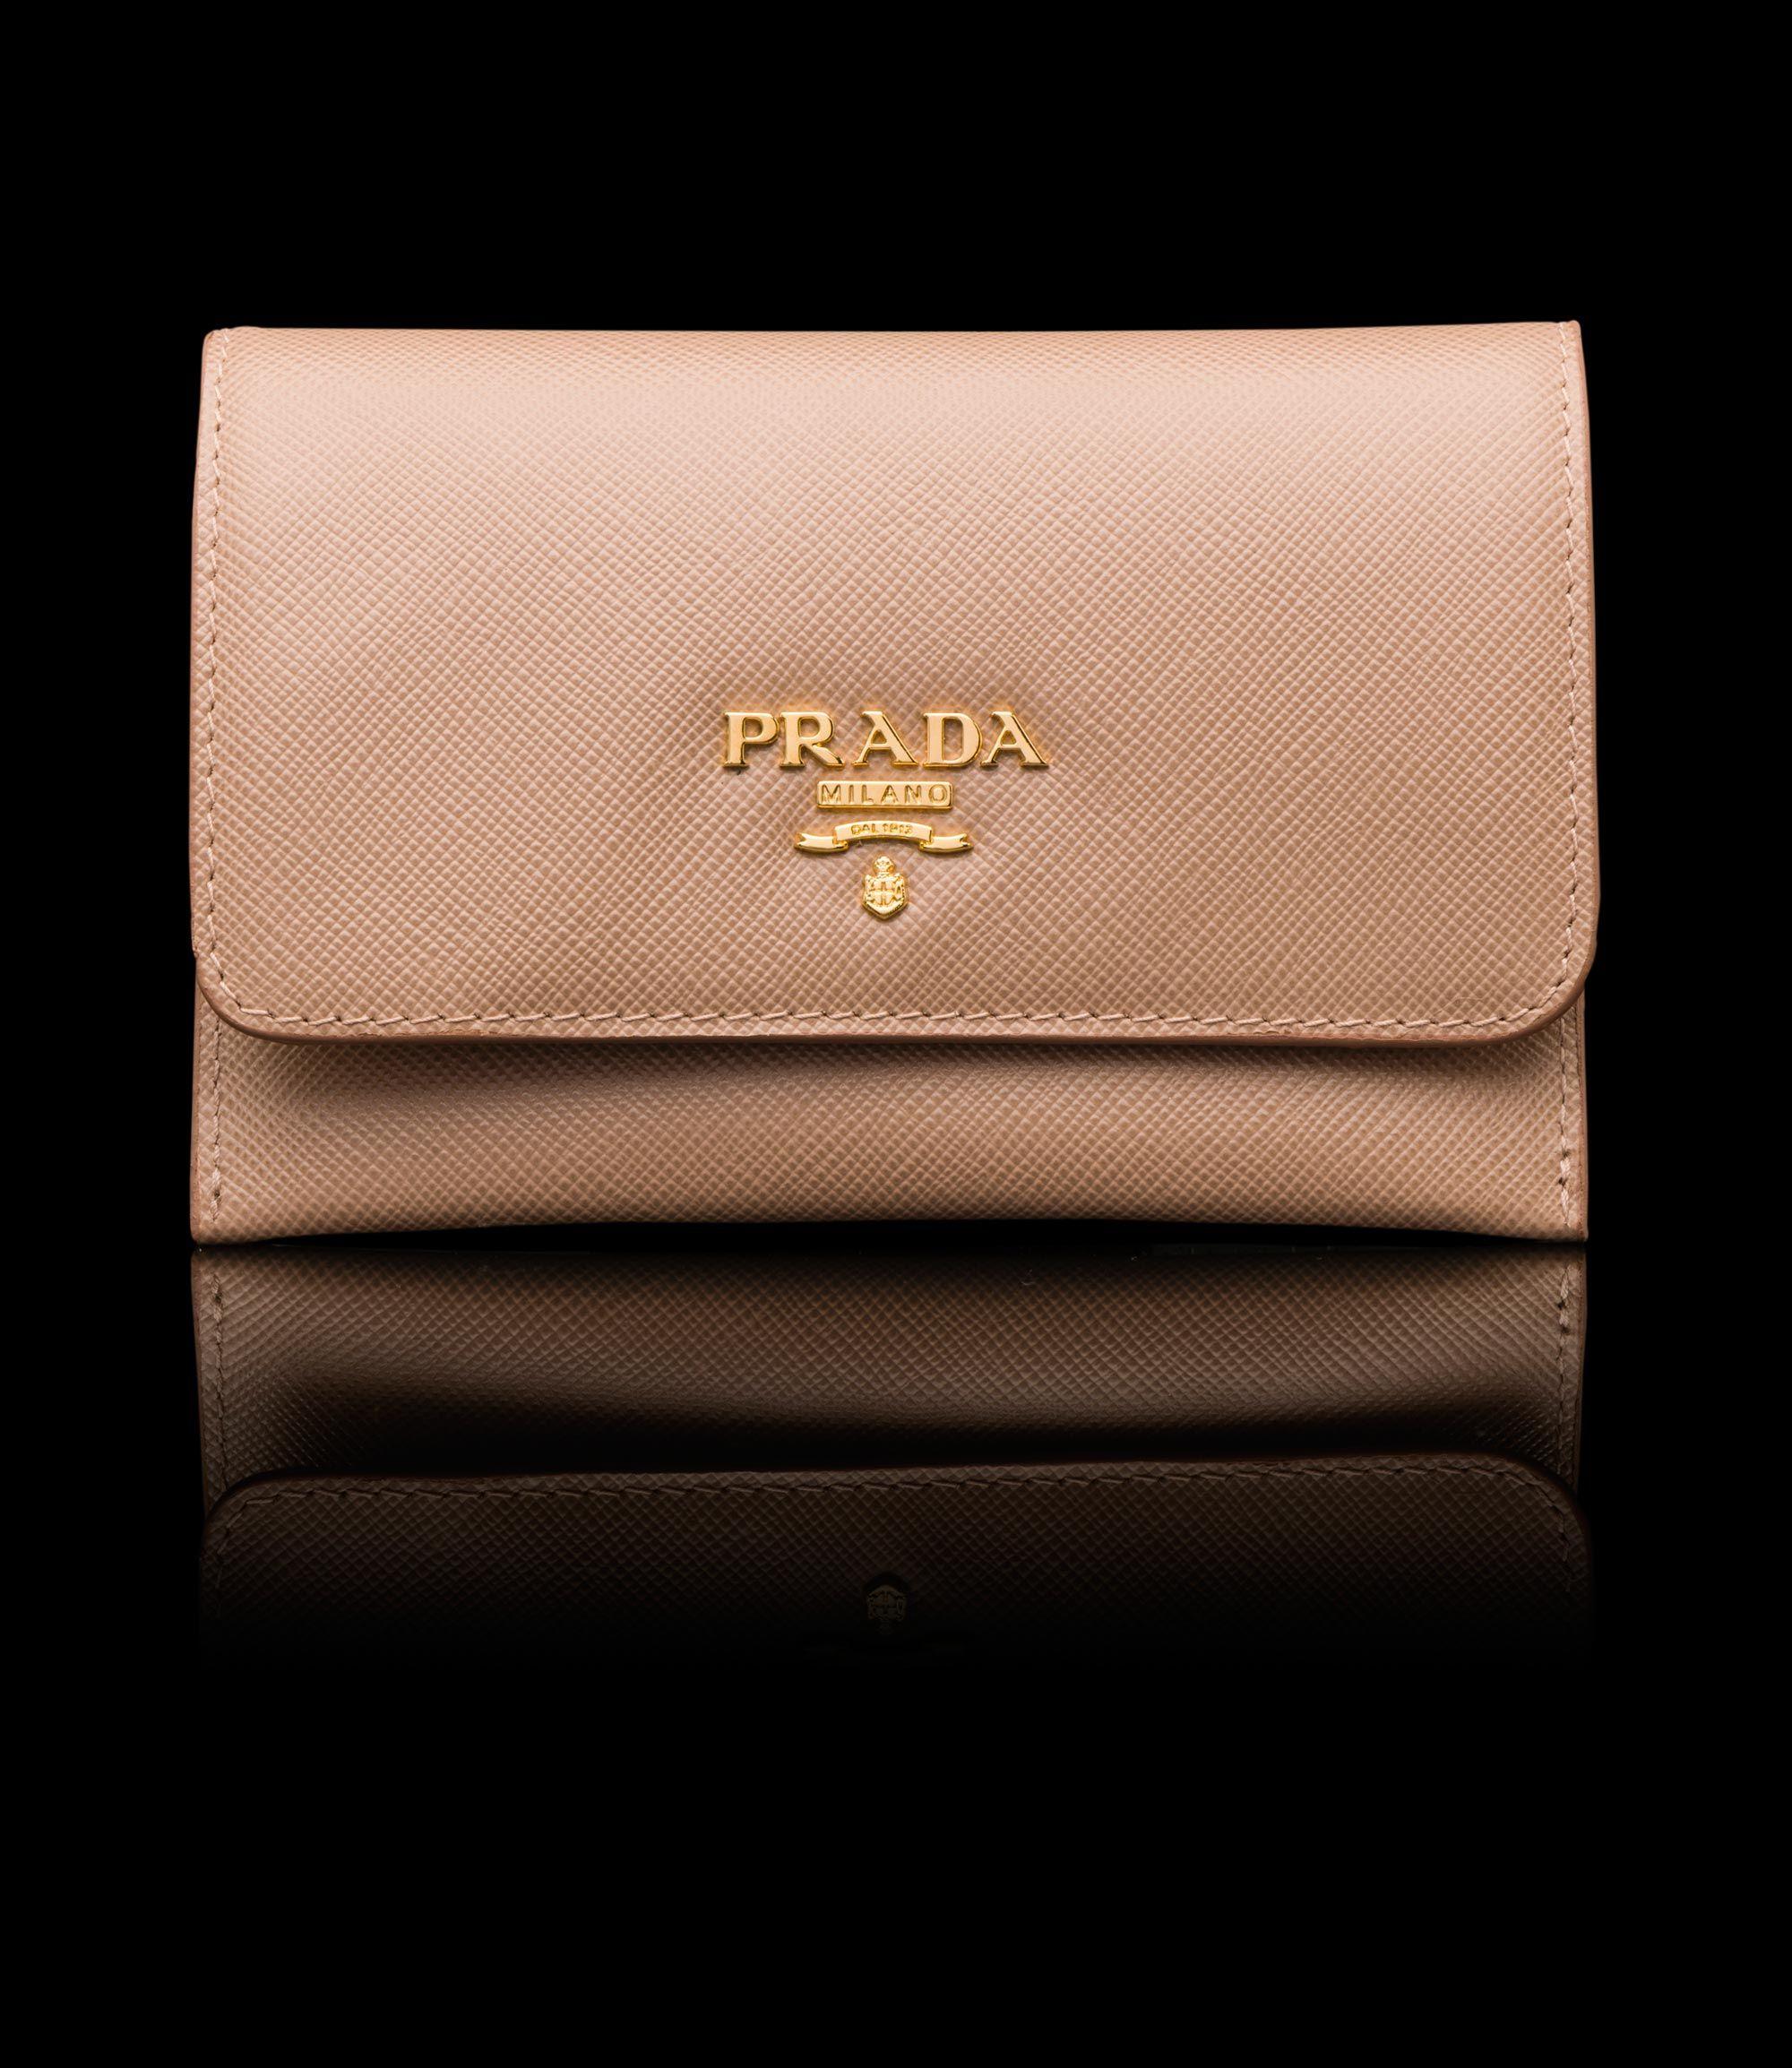 87af93fdeb Prada E-Store · Woman · Gifts · Credit Card Holder 1M1362_QWA_F0770 ...